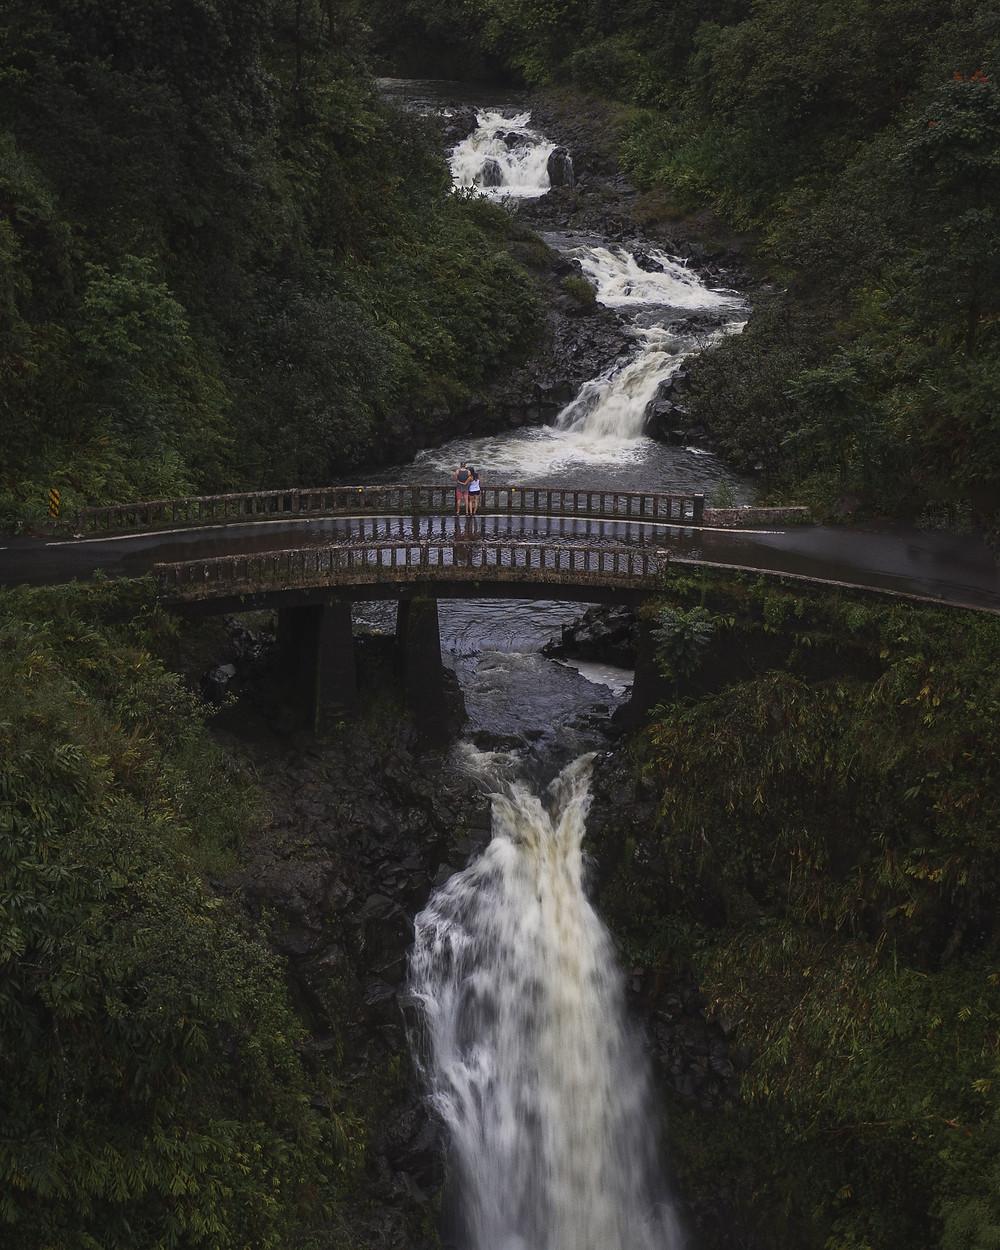 Couple standing on a bridge overlooking waterfalls on the road to Hana